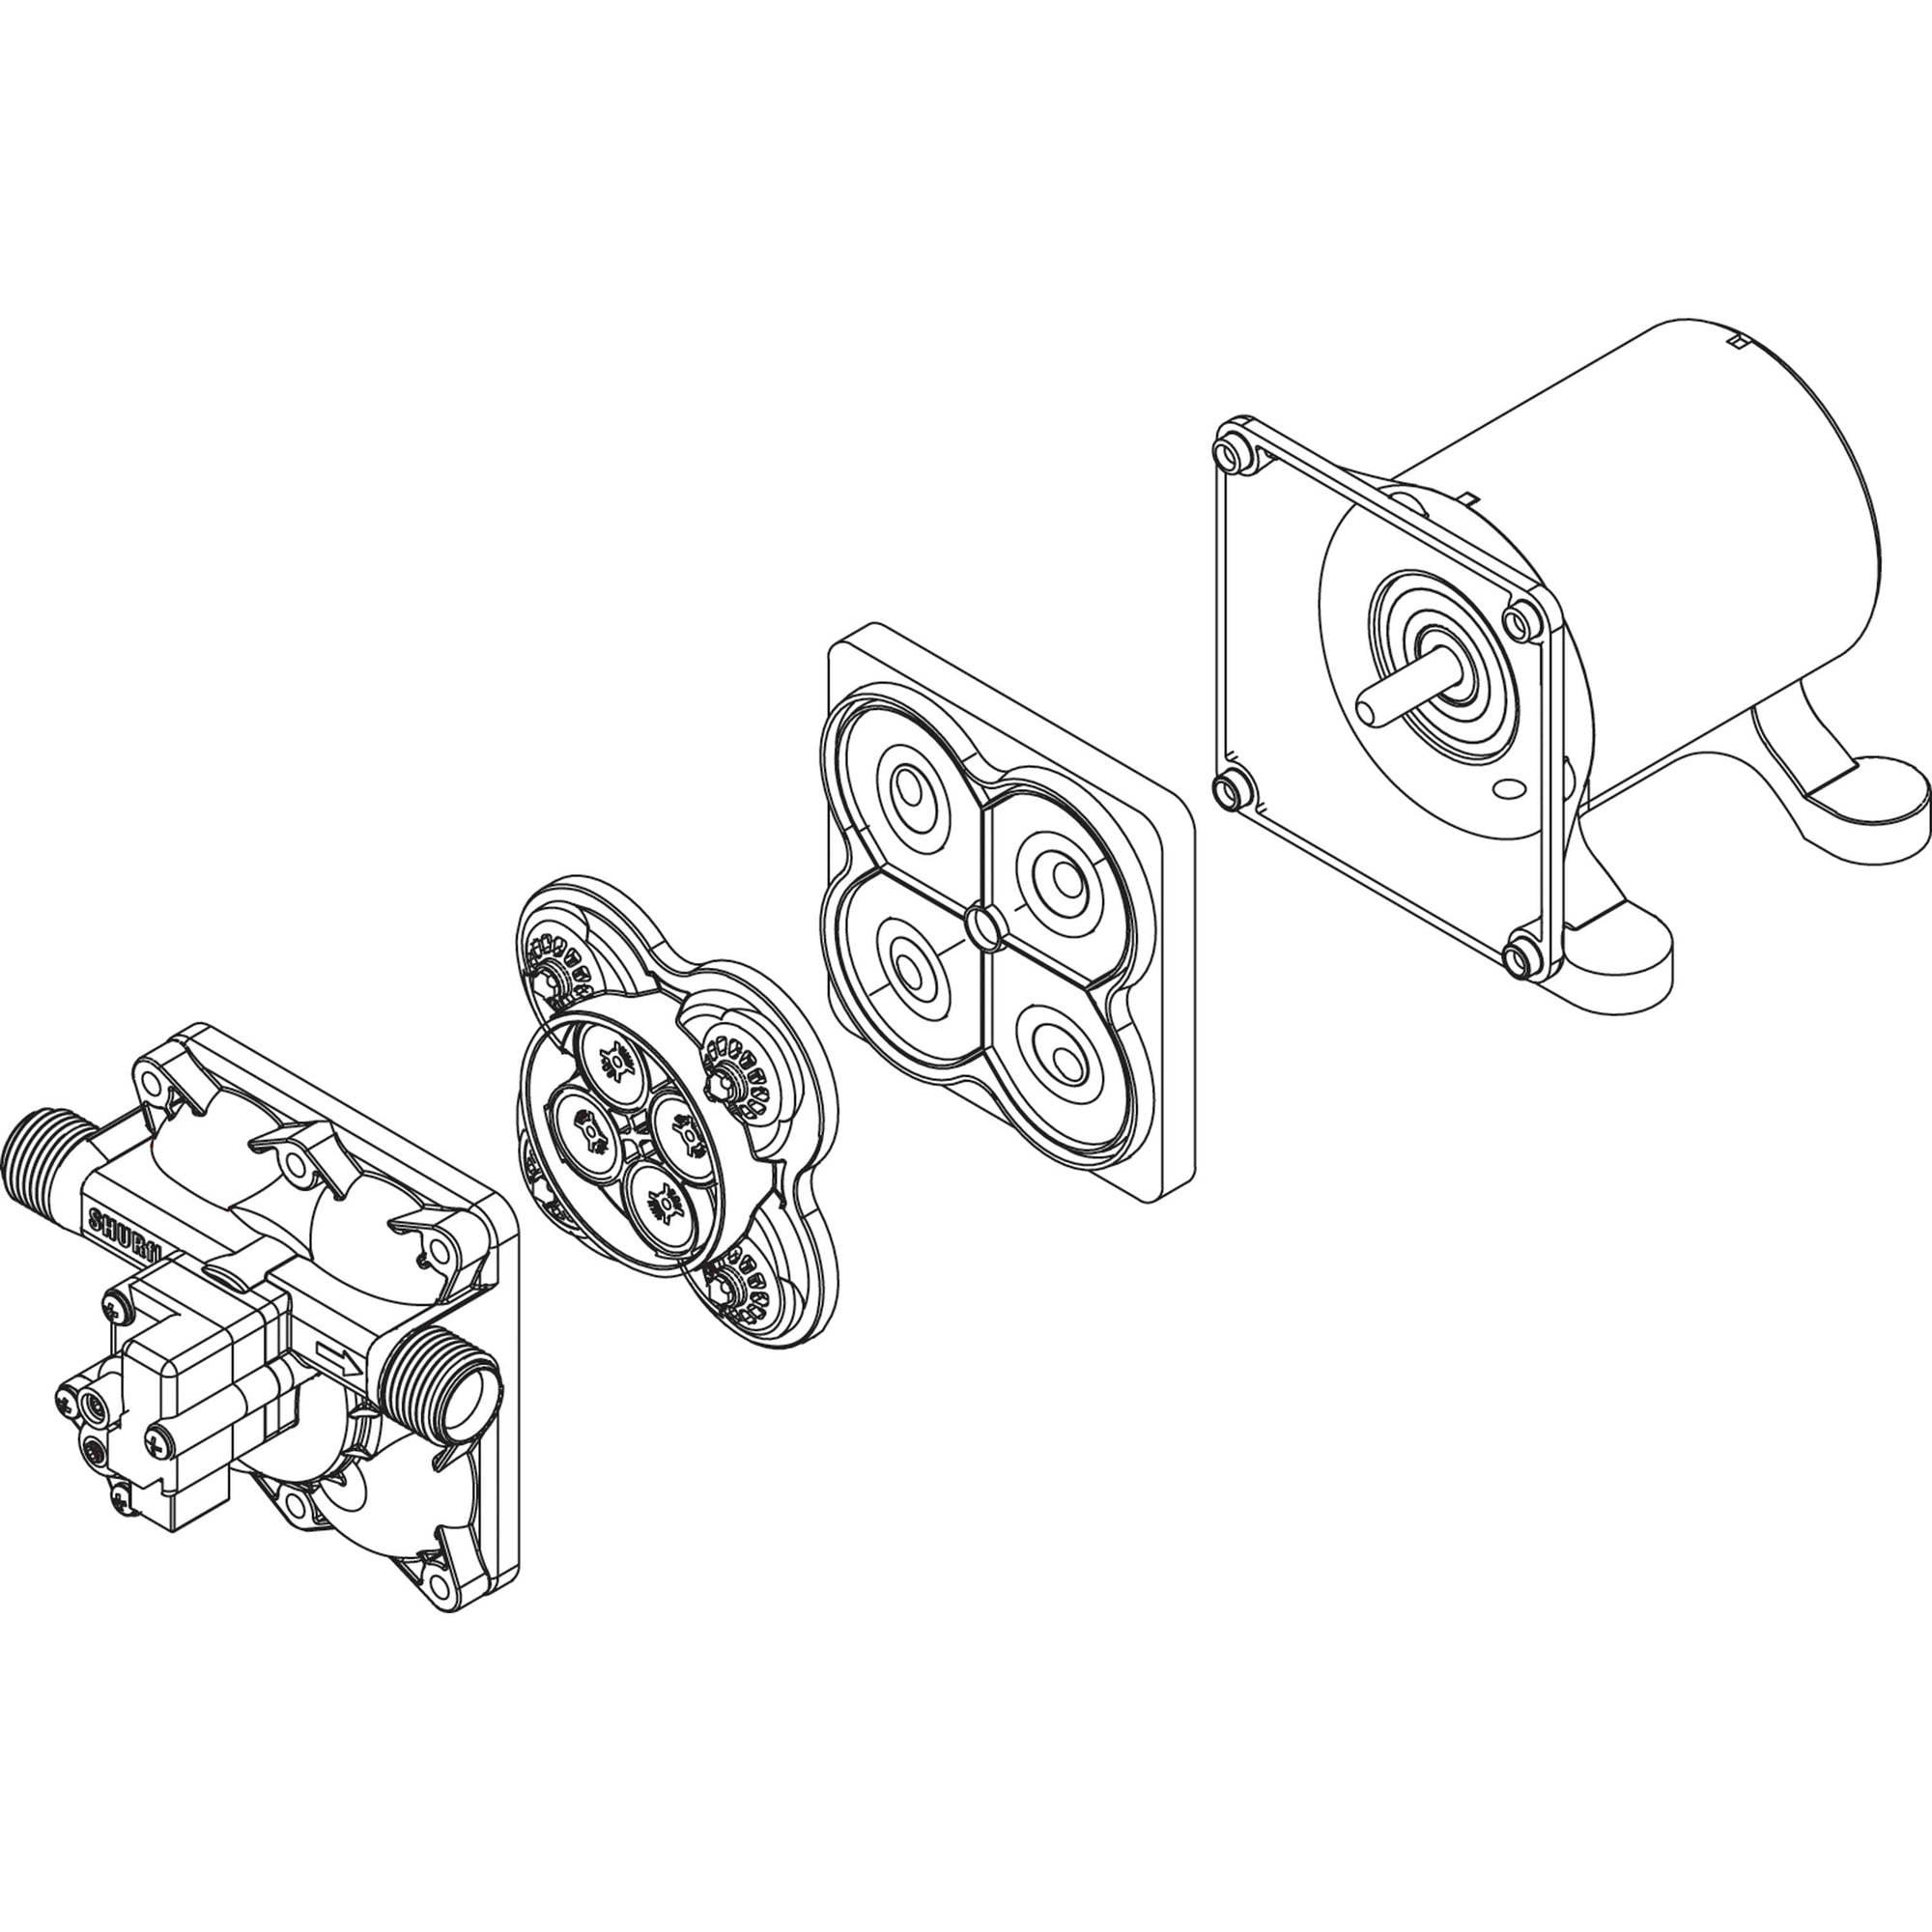 Shurflo 94 800 03 Model 4008 Repair Parts Check Valve